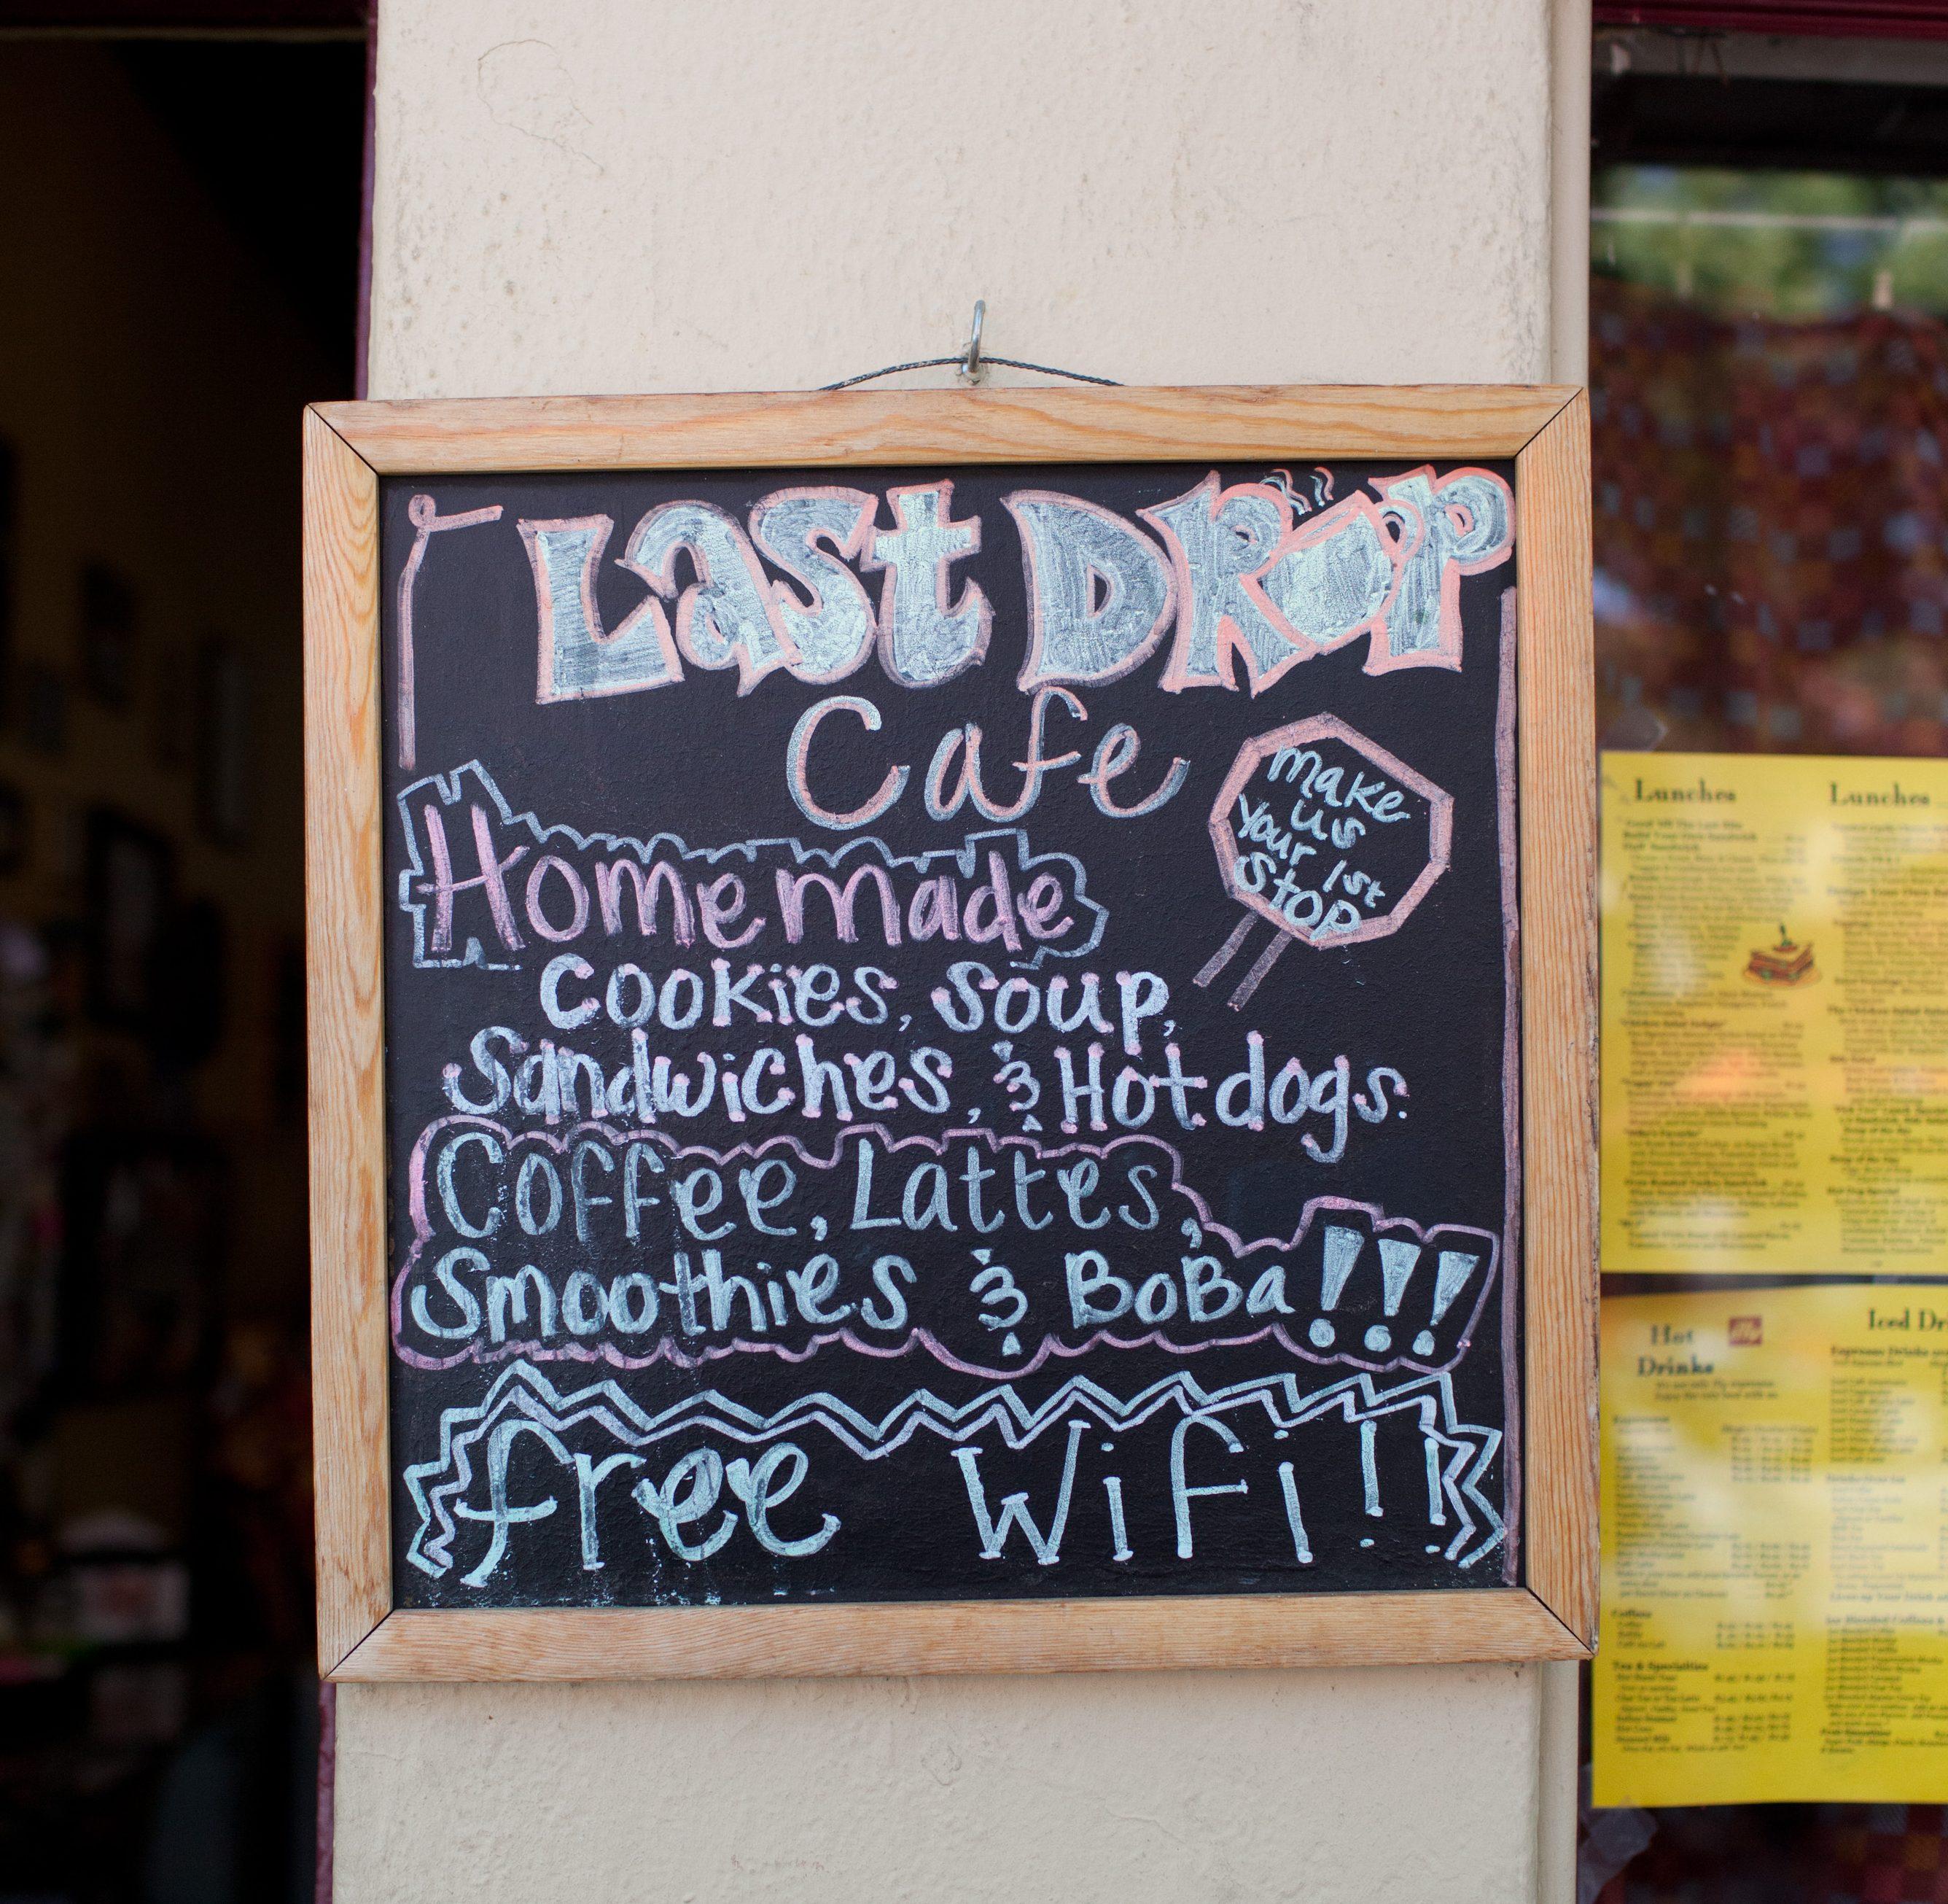 Last Drop Cafe Menu Sign In Claremont Ca Discover